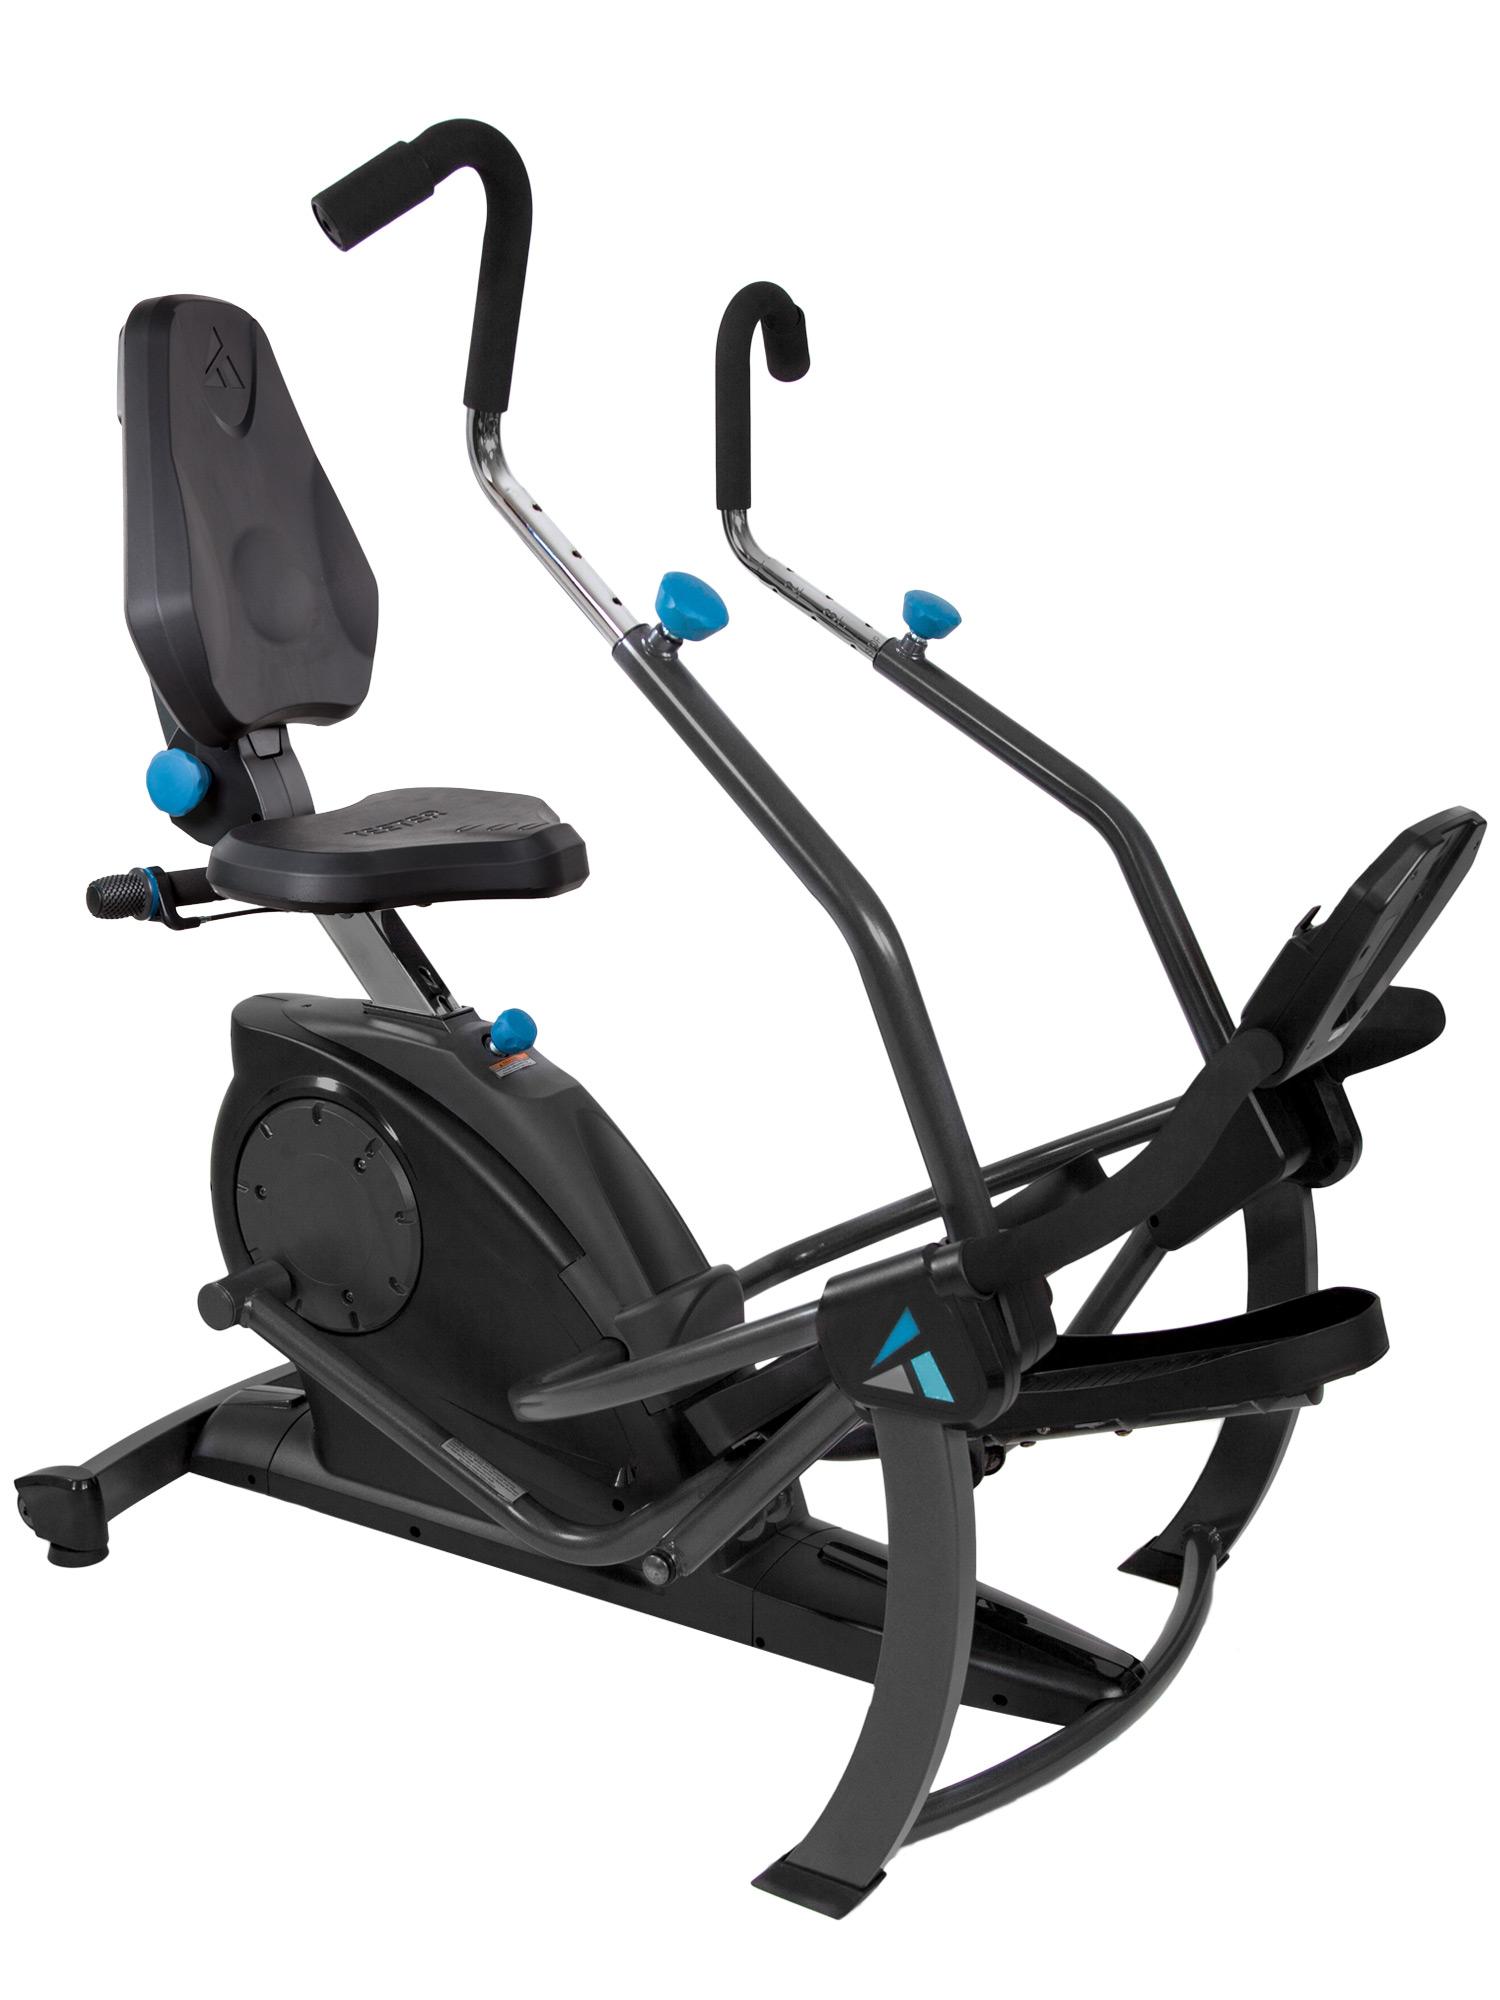 Teeter FreeStep Recumbent Full Body Trainer by Fitness Market Louisville